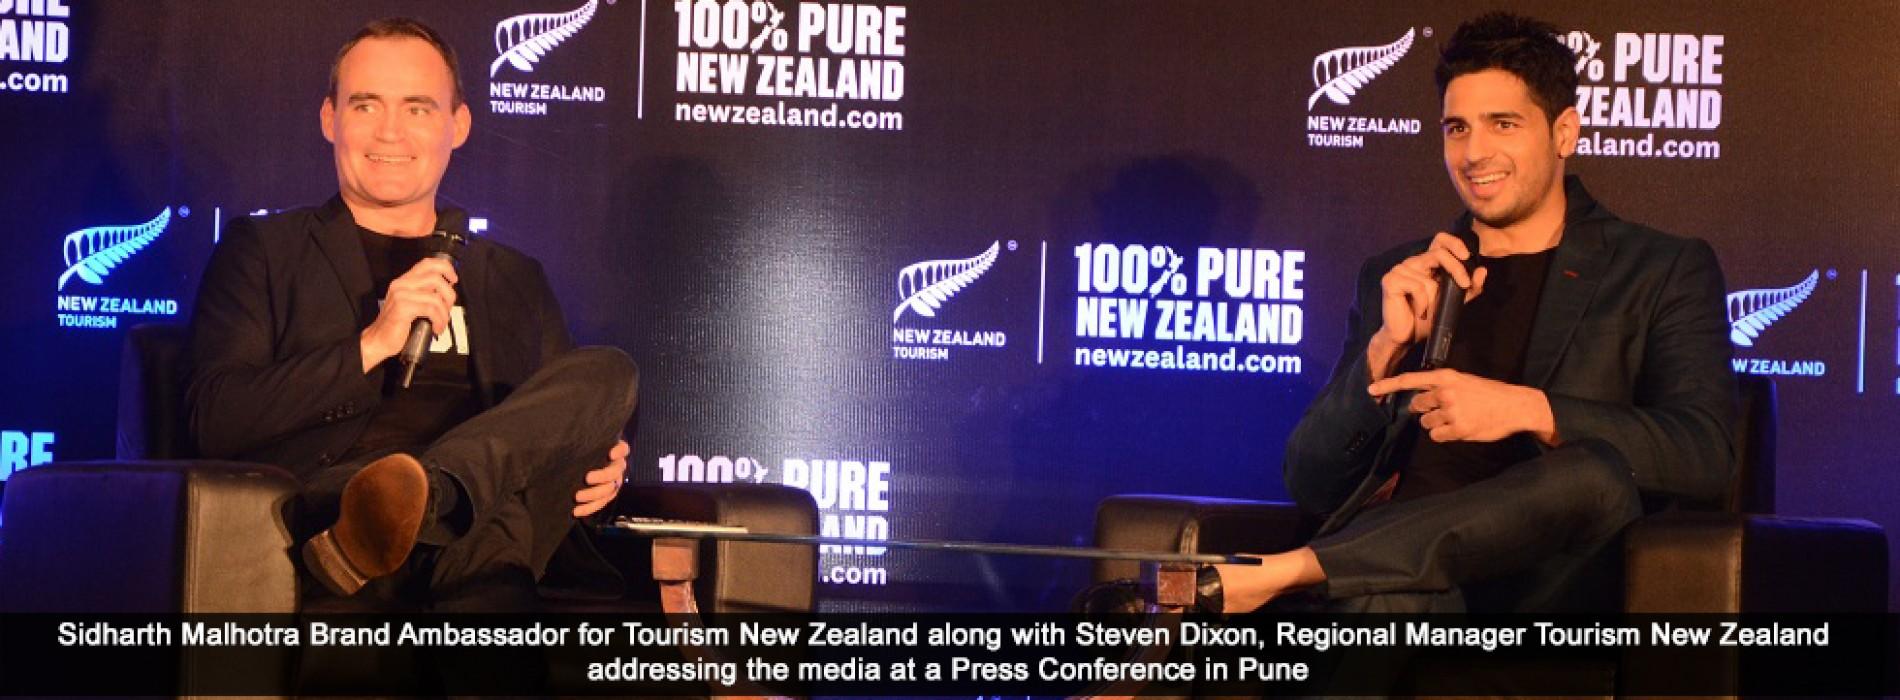 Bollywood actor Sidharth Malhotra recalls his New Zealand escapades to the Pune media